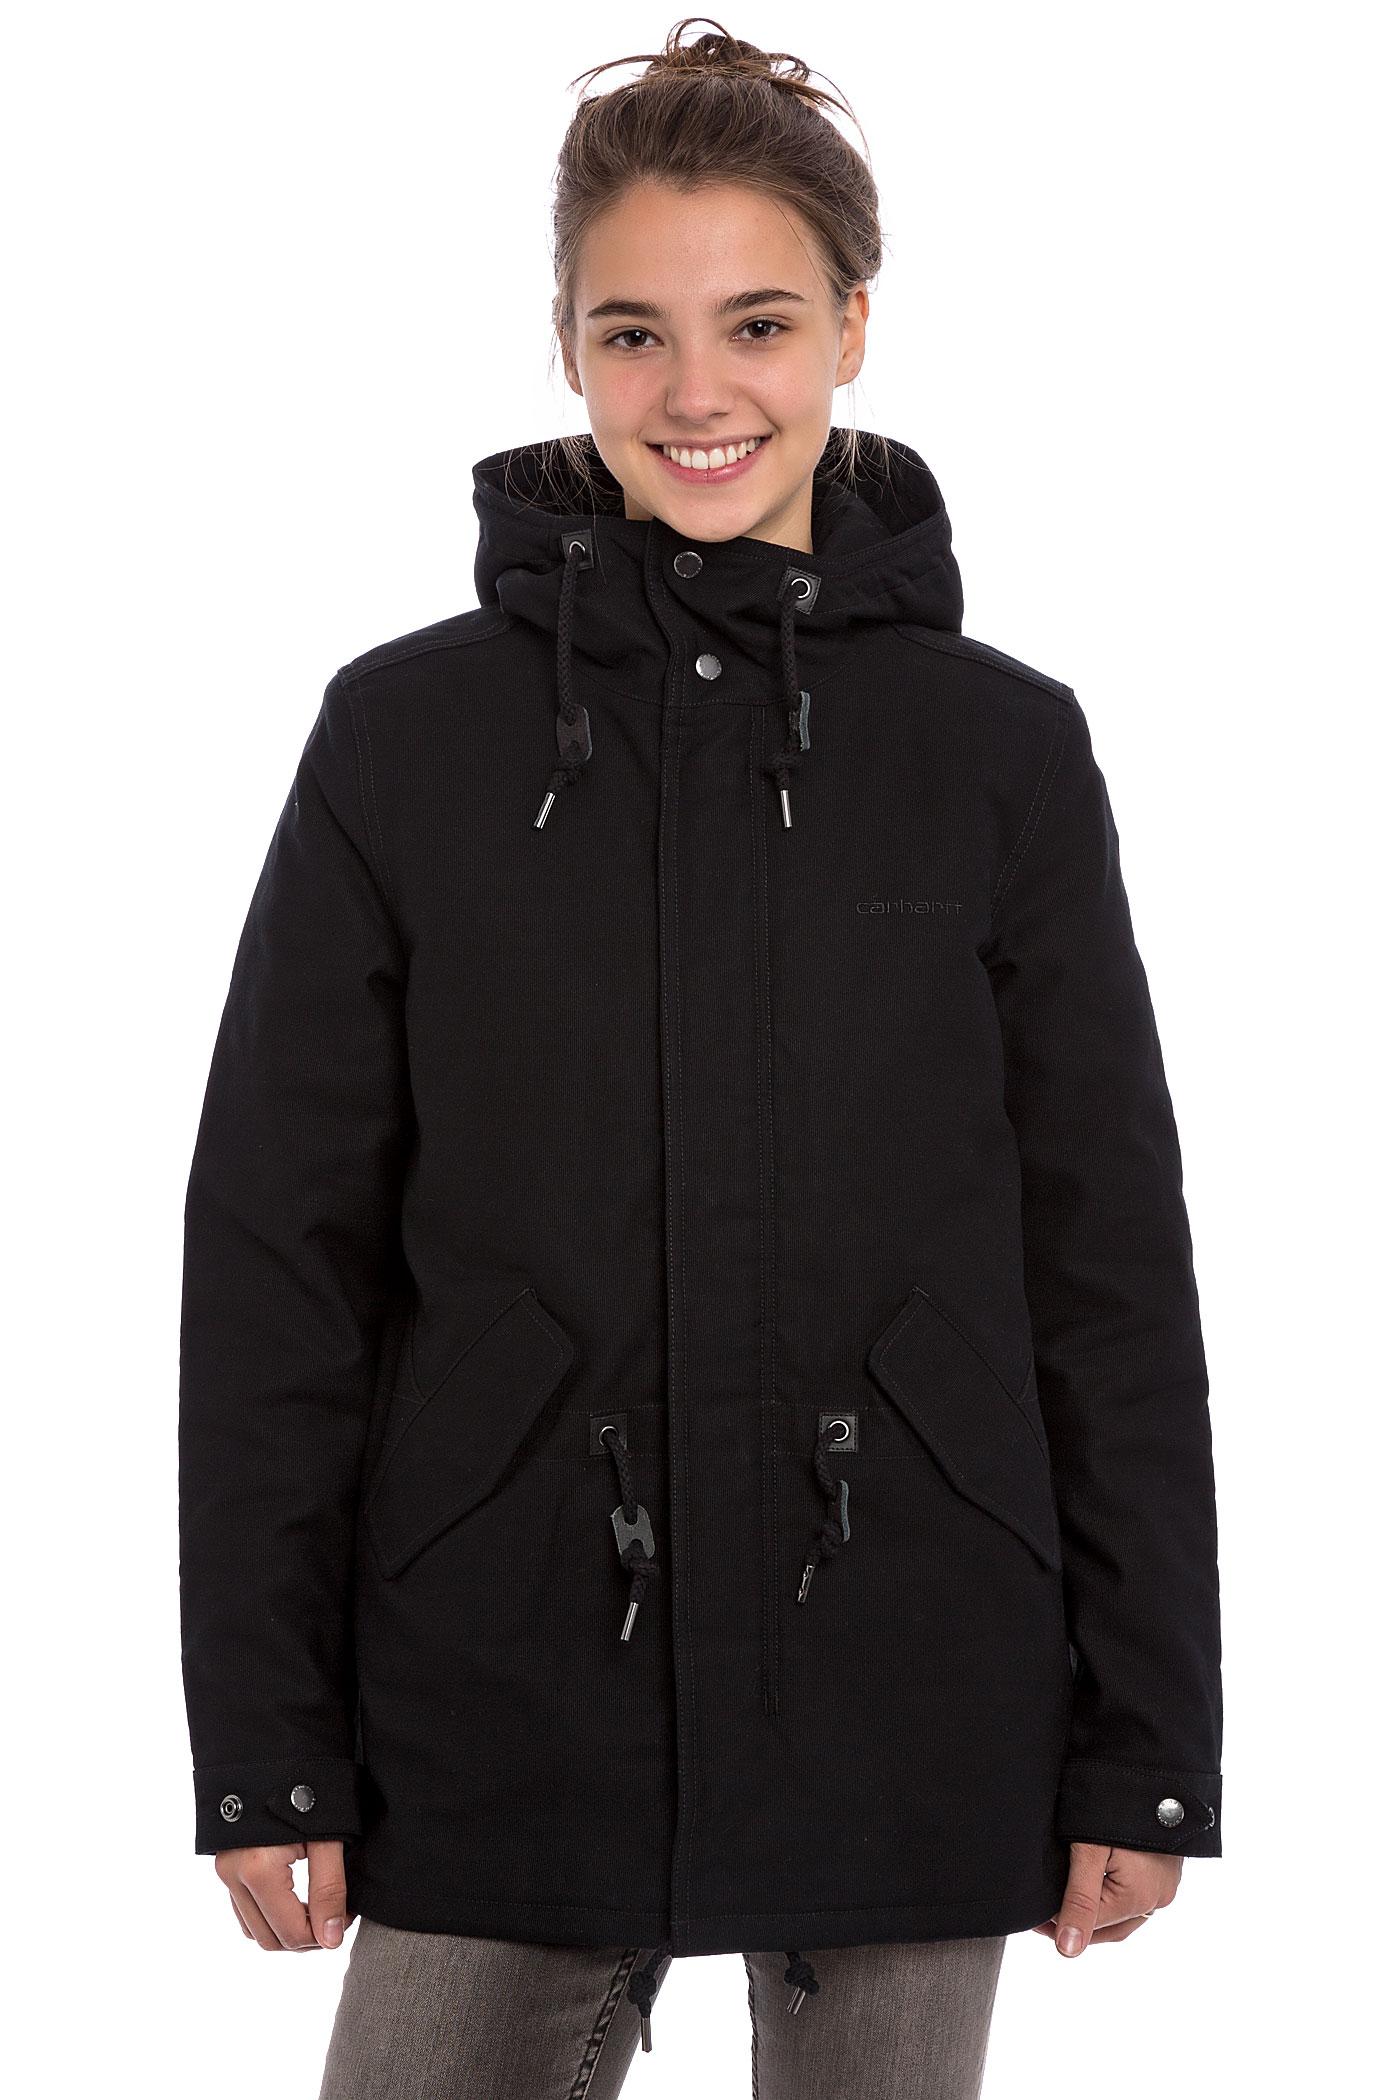 carhartt wip w 39 clash parka jacket women black buy at. Black Bedroom Furniture Sets. Home Design Ideas